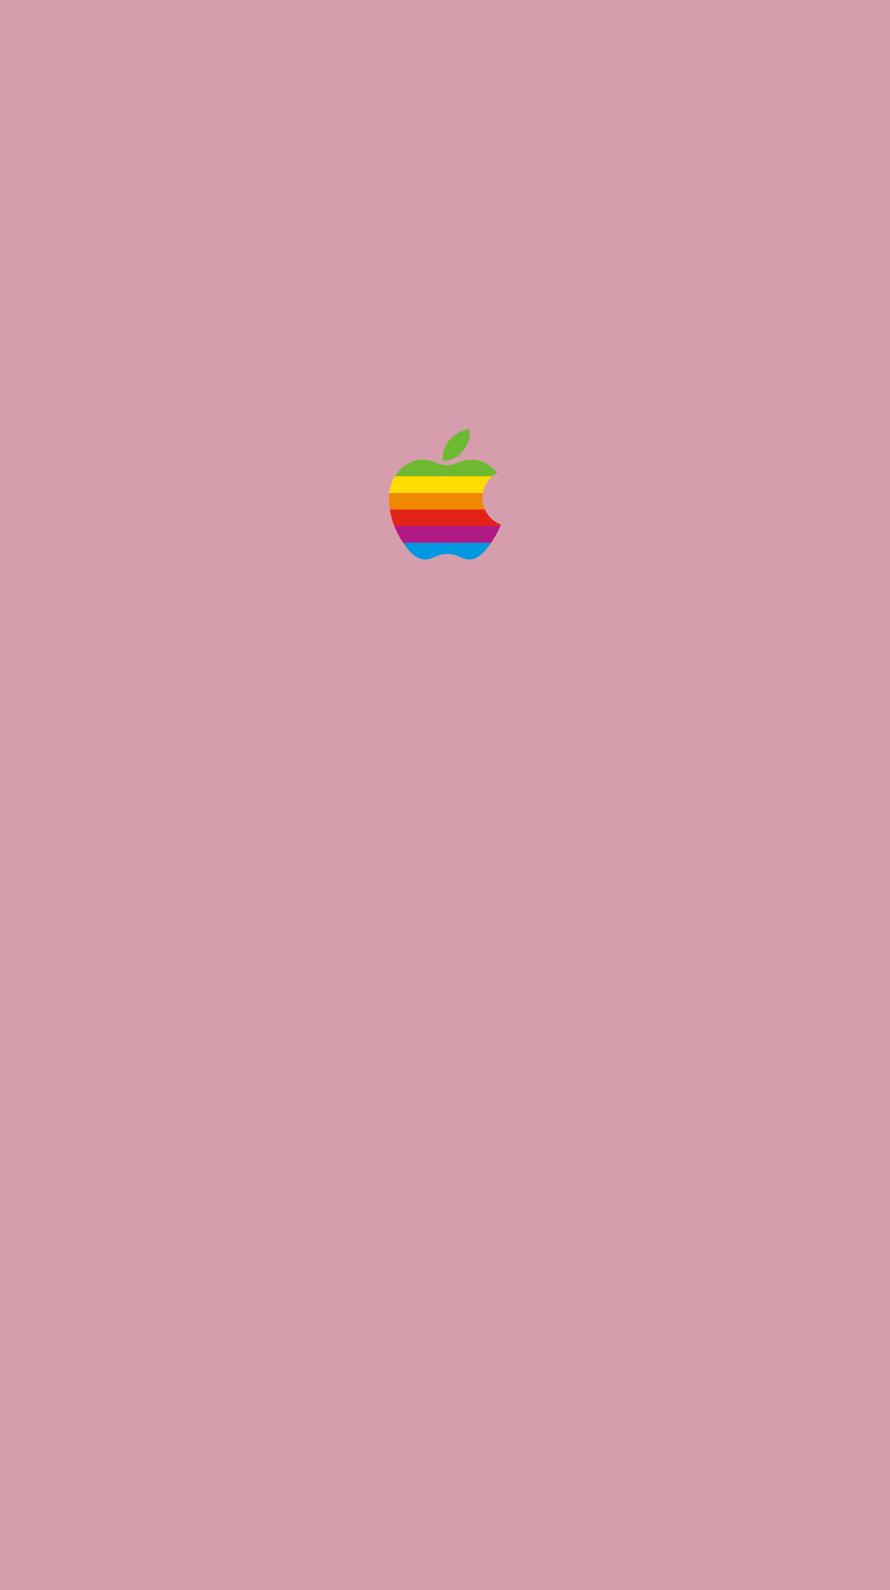 iPhone7, 6, 5用壁紙 Appleレインボーロゴ Rose